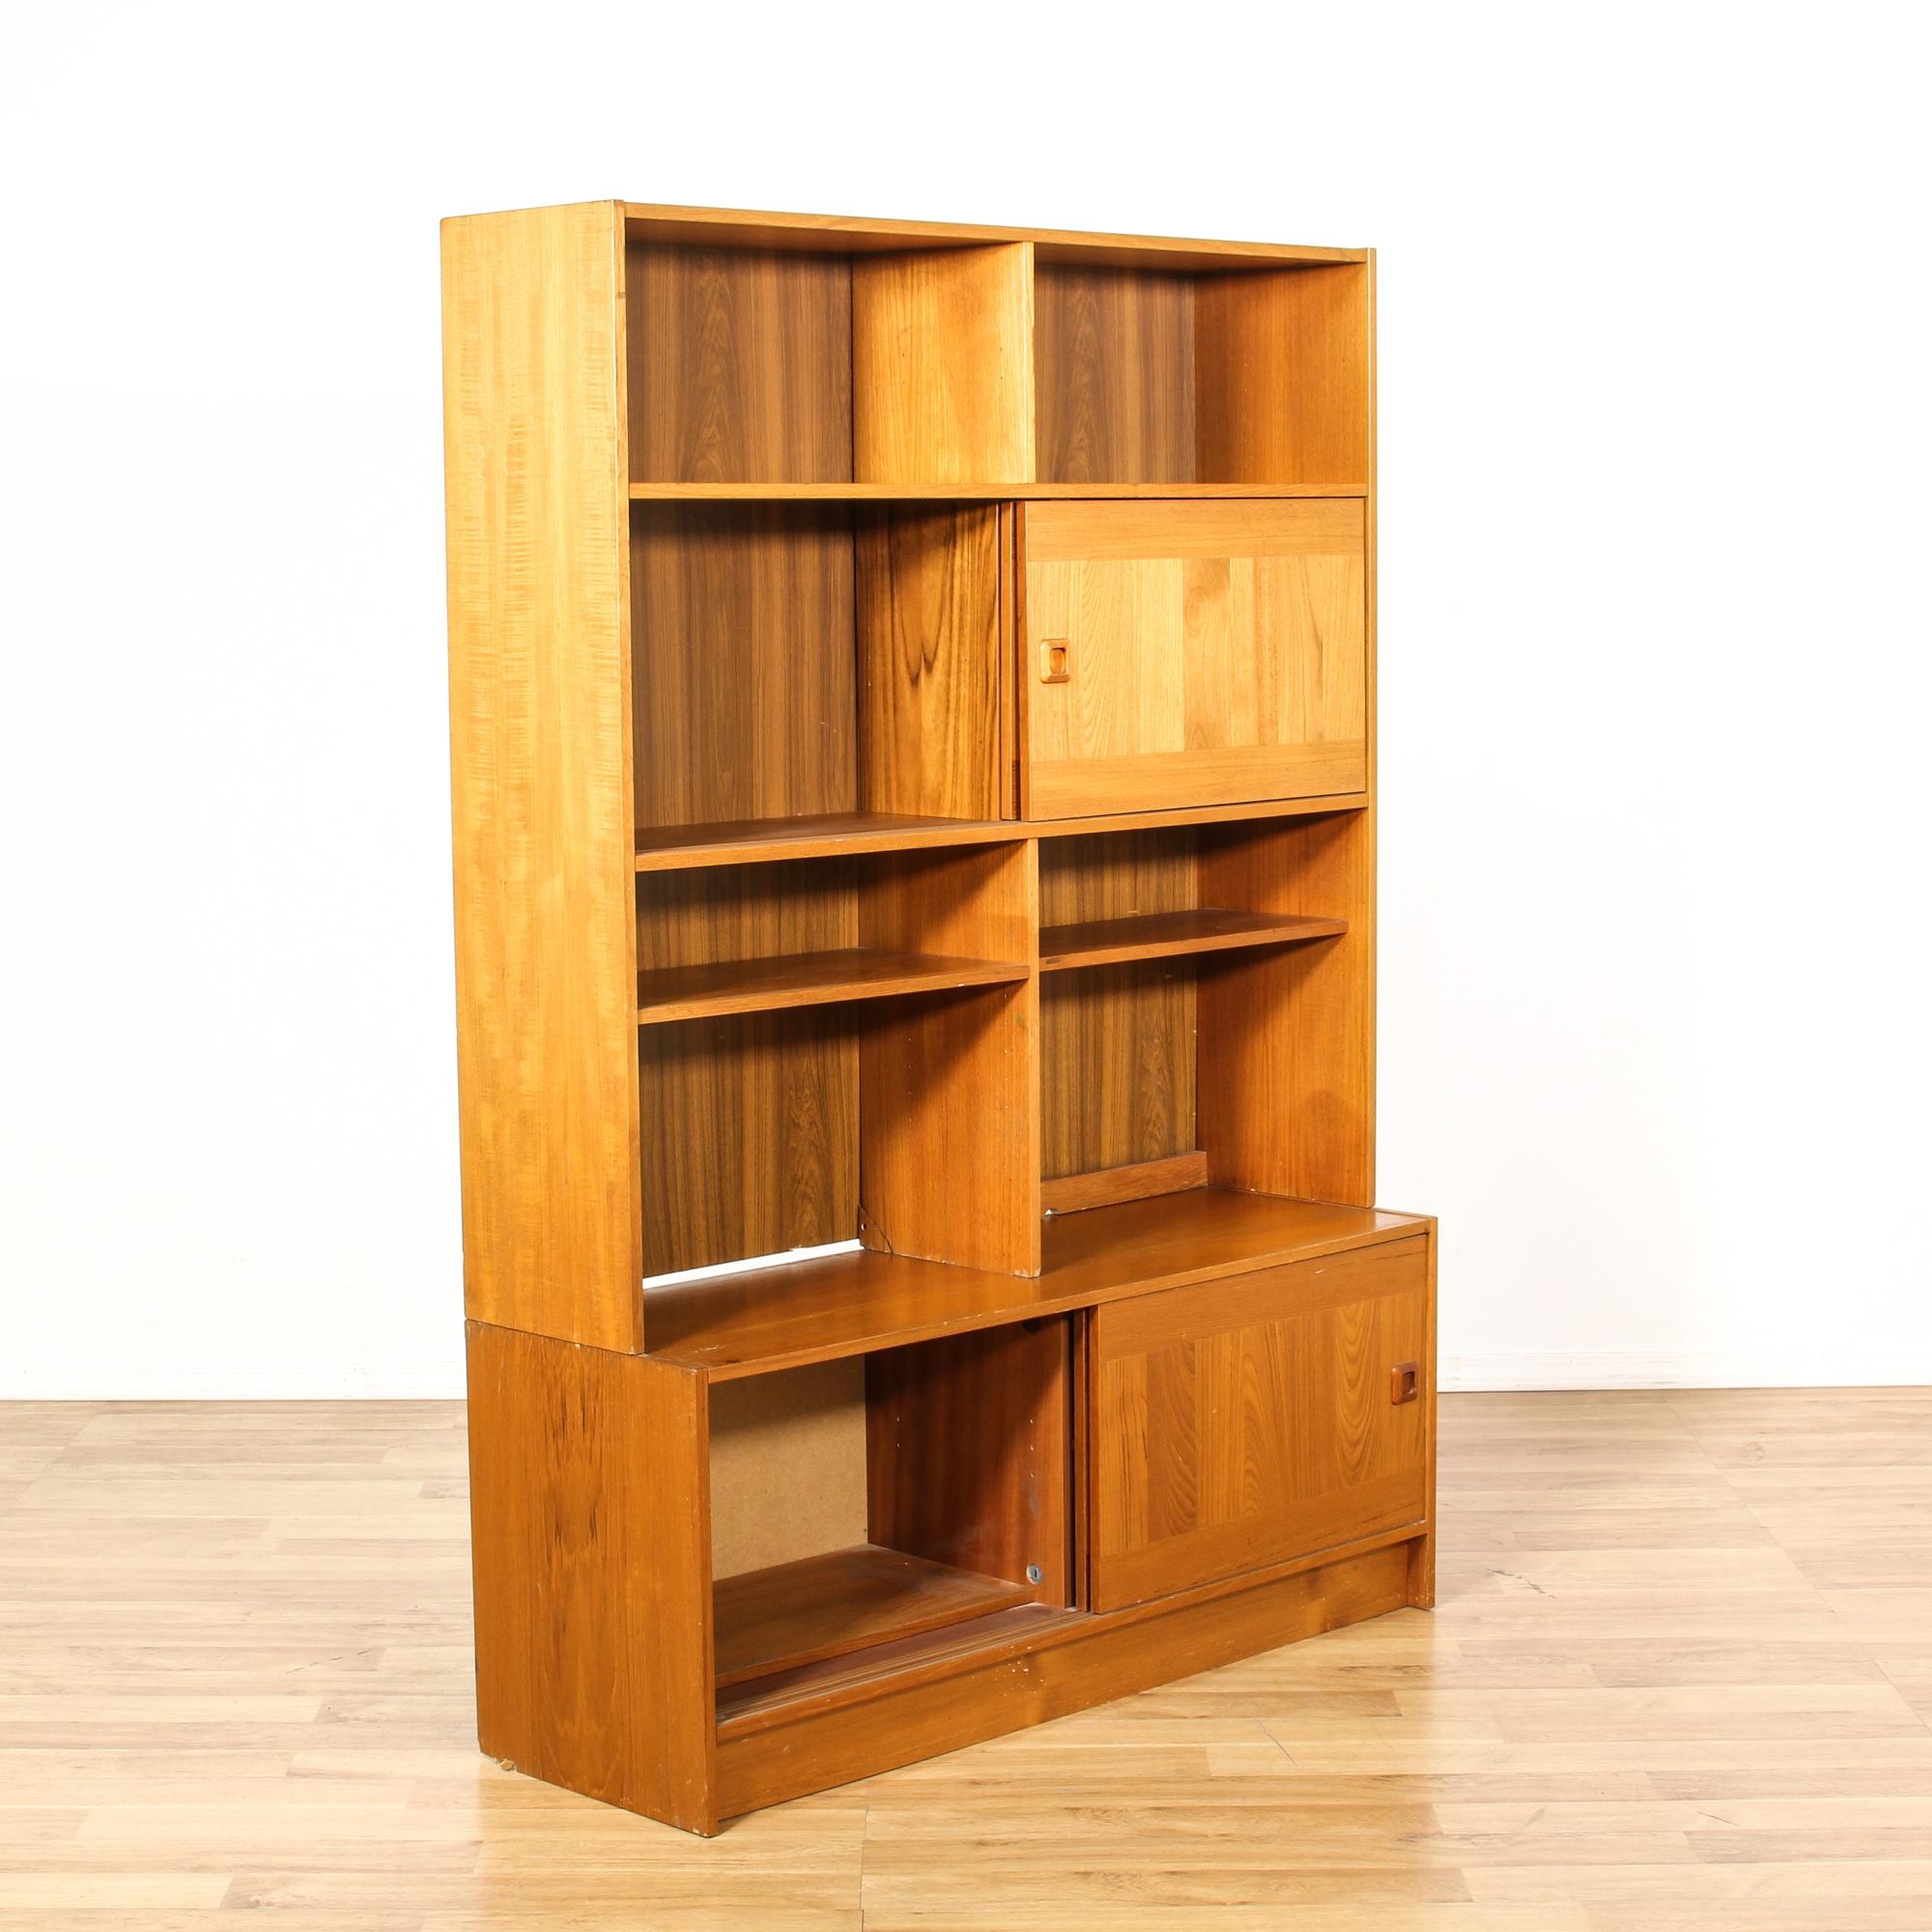 Domino mobler danish modern bookcase wall unit loveseat vintage furniture san diego los - Modern bookshelf wall unit ...